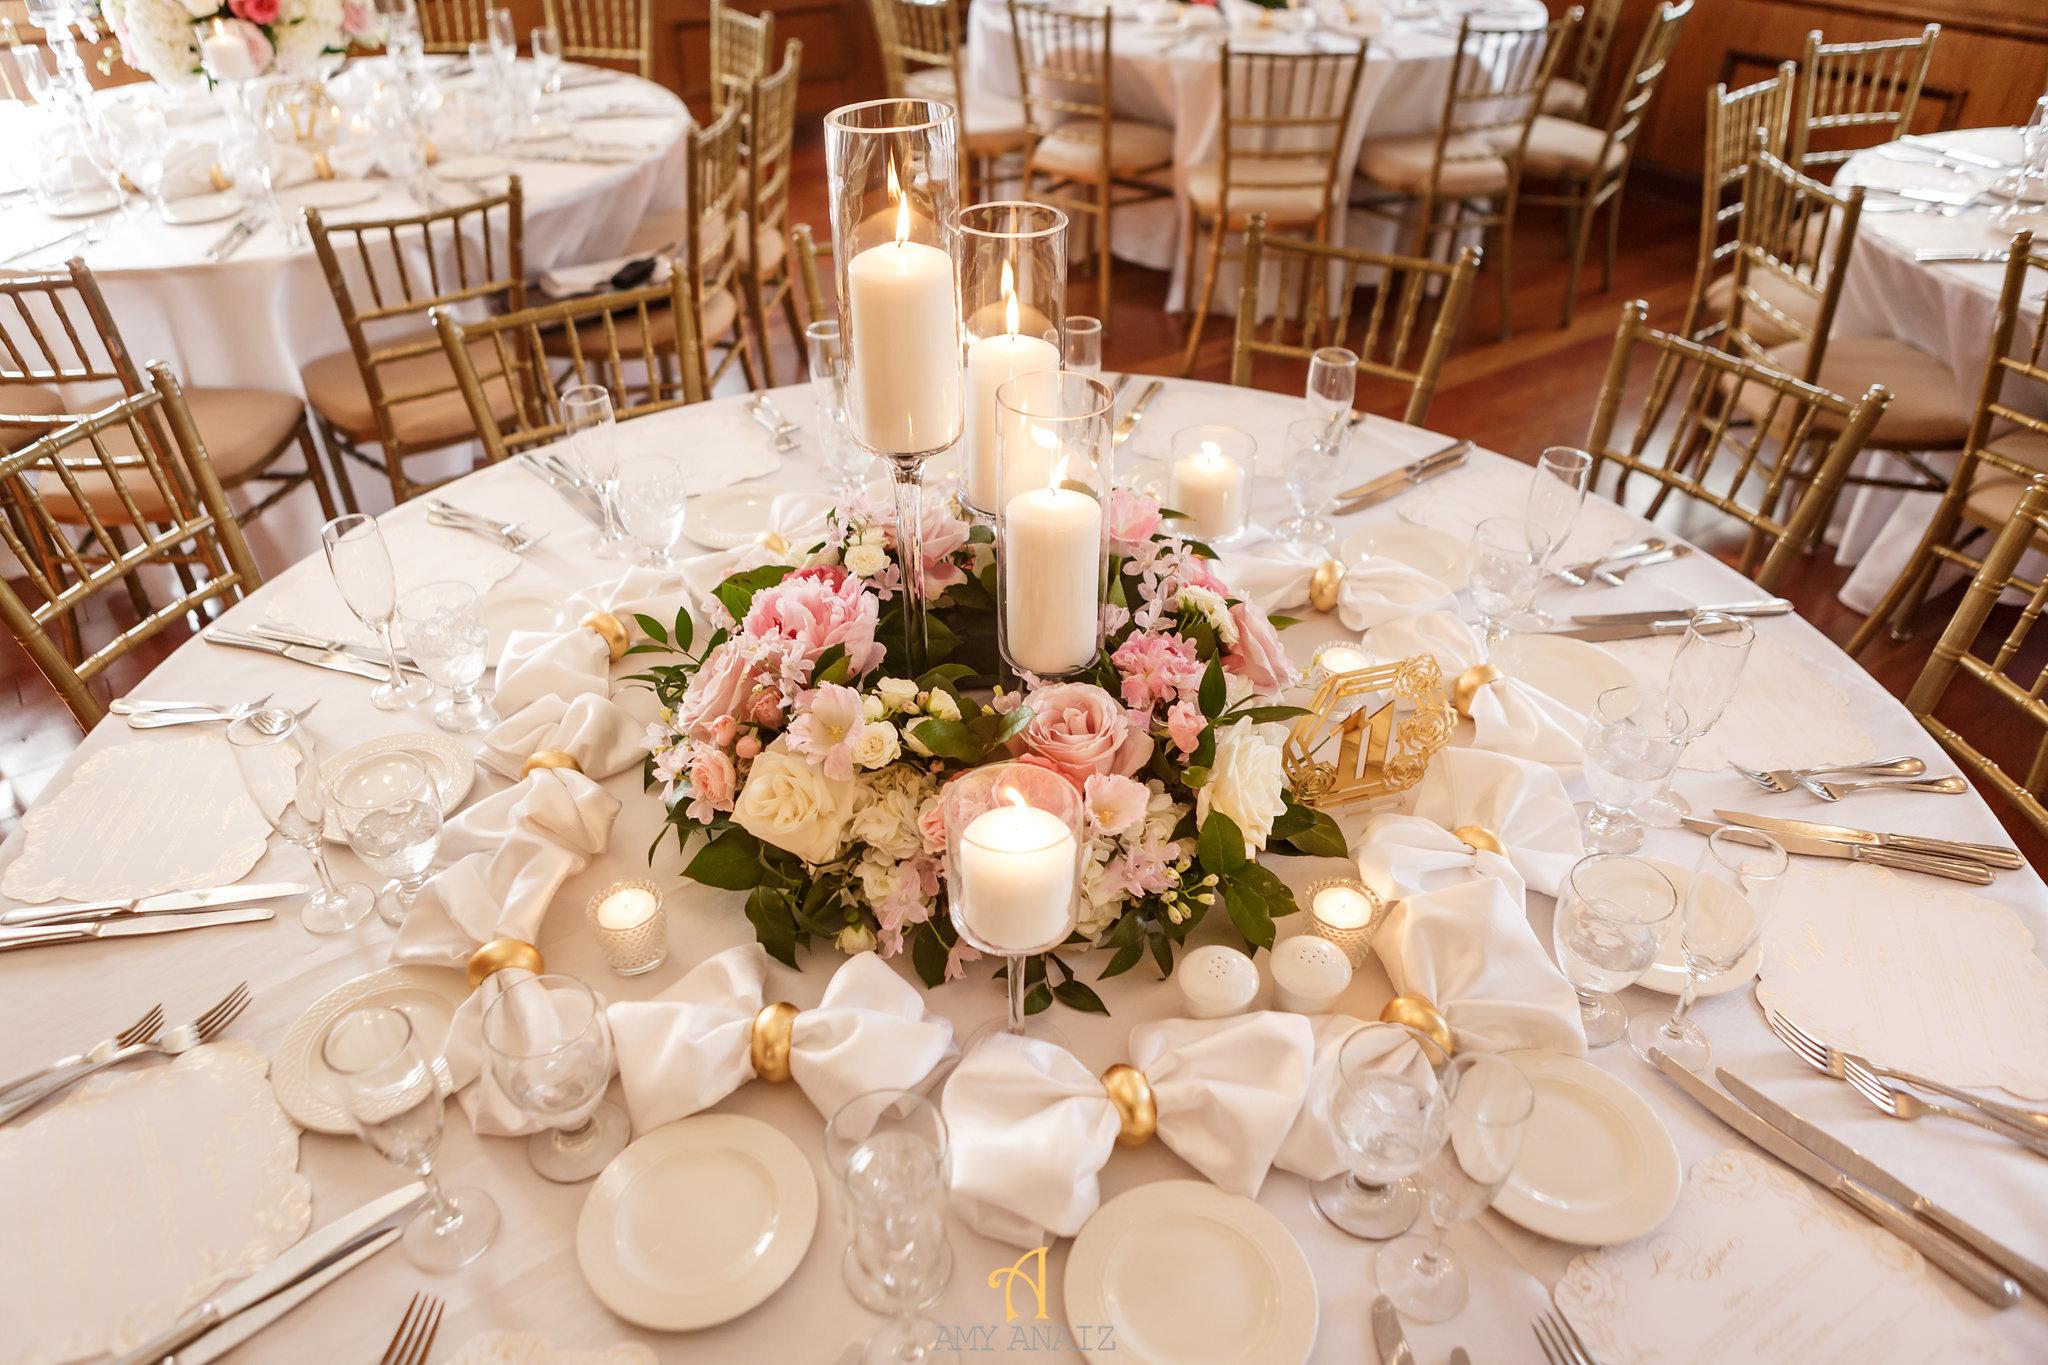 NYIT de Serversky Mansion, Blush Wedding Centerpiece, Candle Centerpiece.JPG